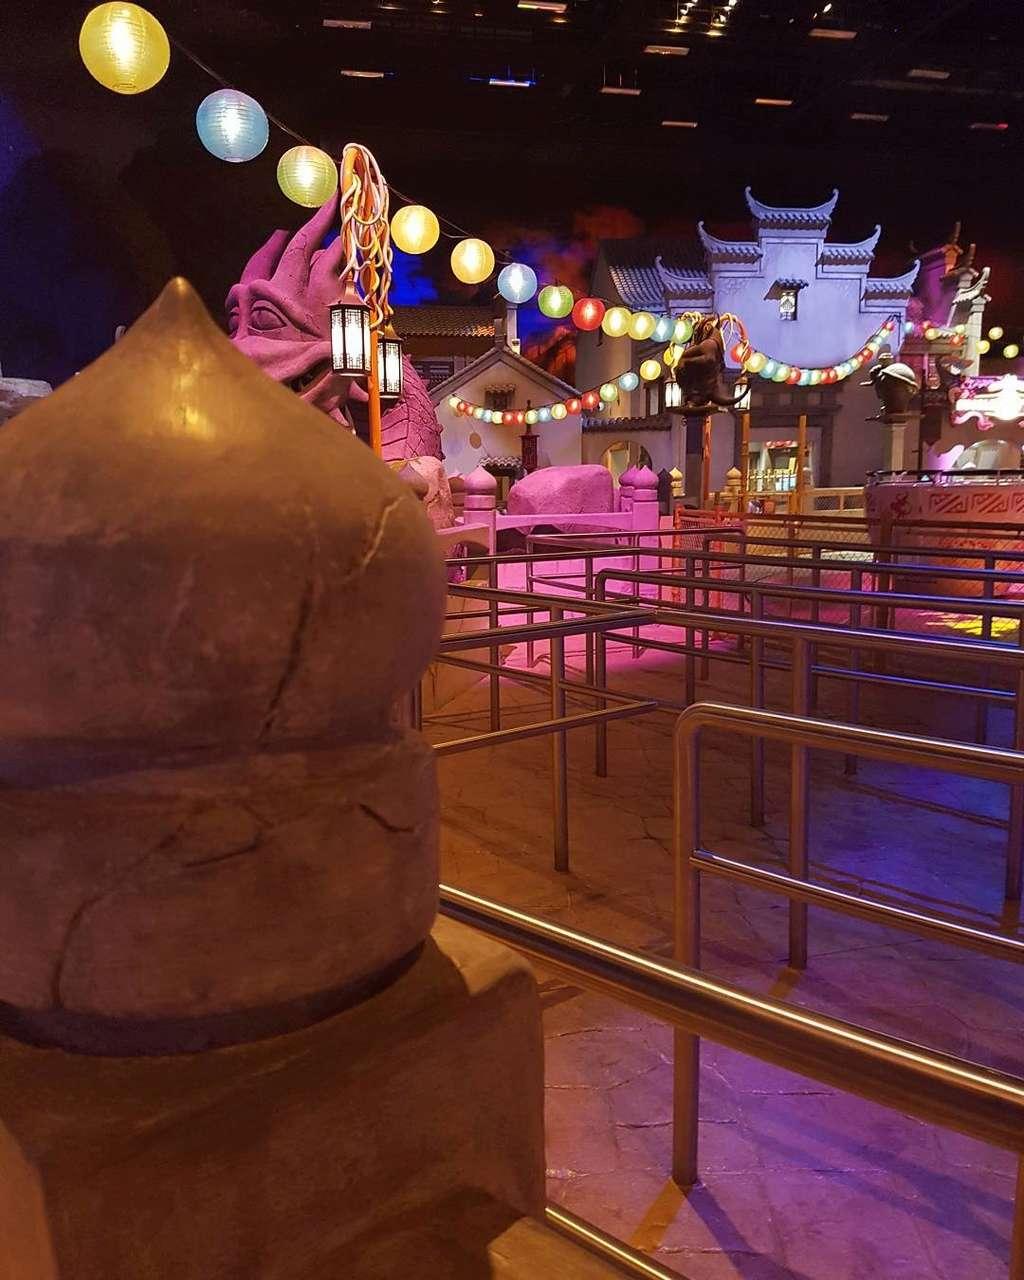 [ÉAU] Dubai Parks & Resorts : motiongate, Bollywood Parks, Legoland (2016) et Six Flags (2019) - Page 6 Kungfu12